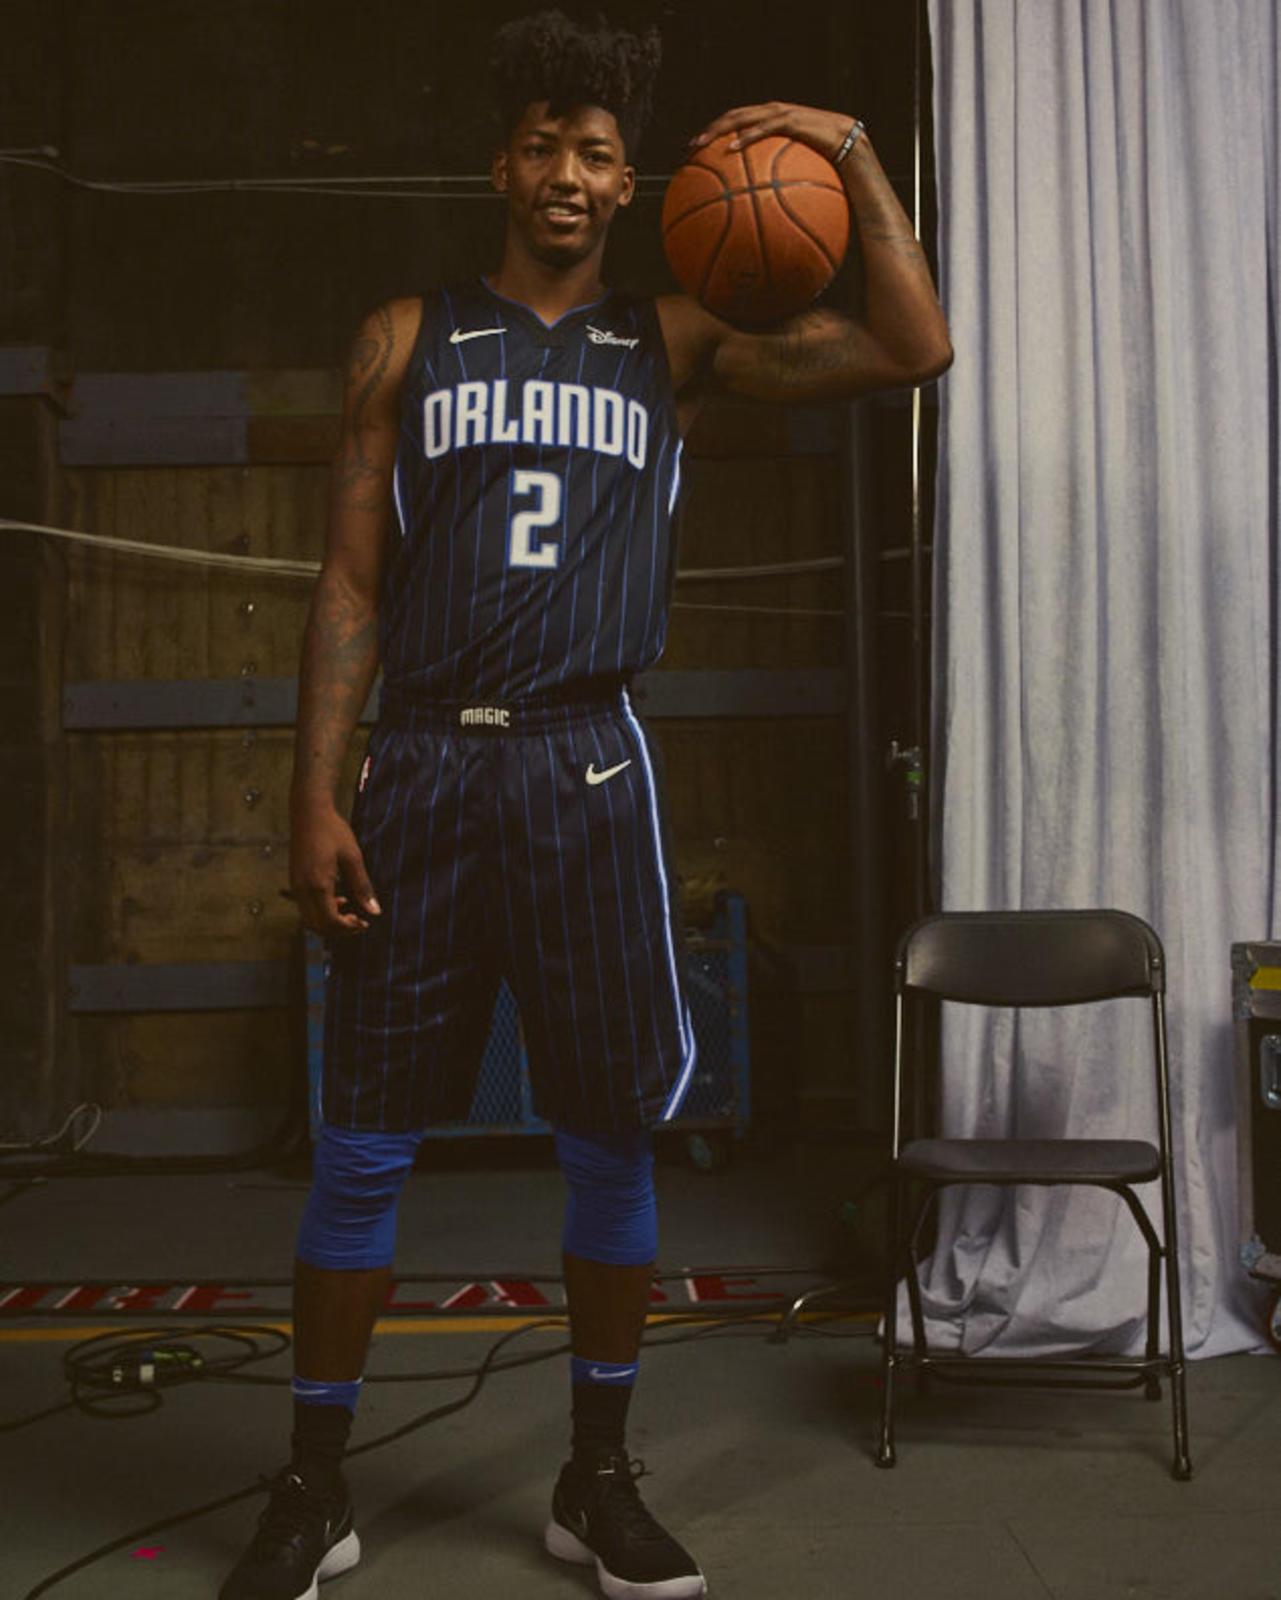 Nike NBA Statement Edition uniform Orlando